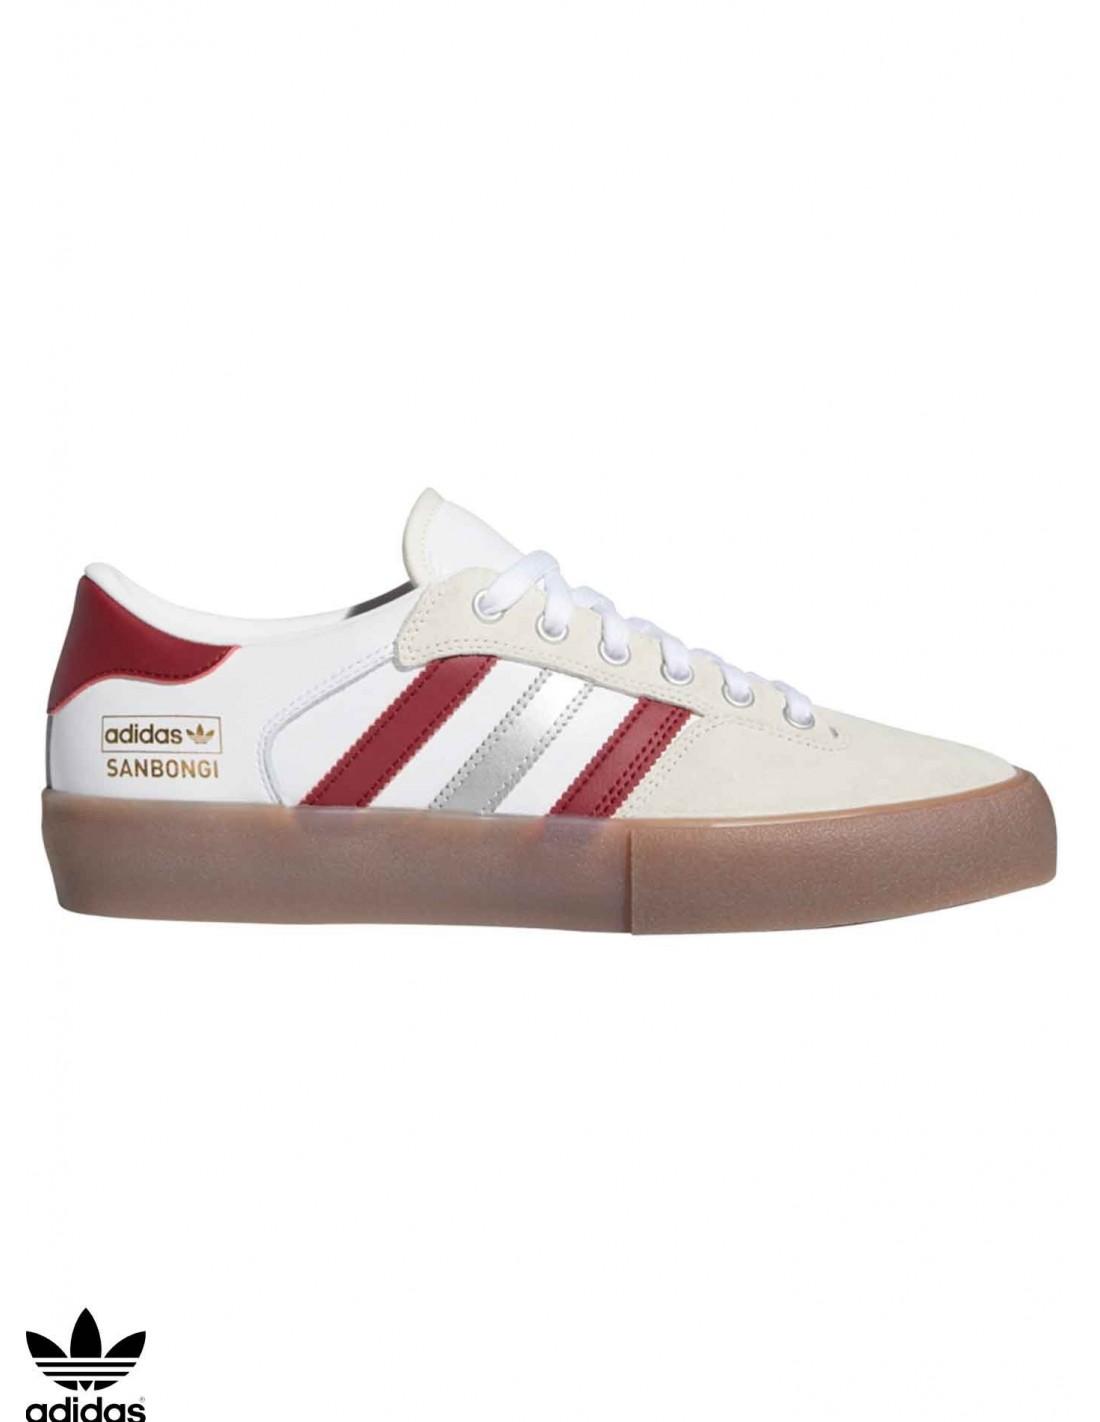 adidas chaussures skate